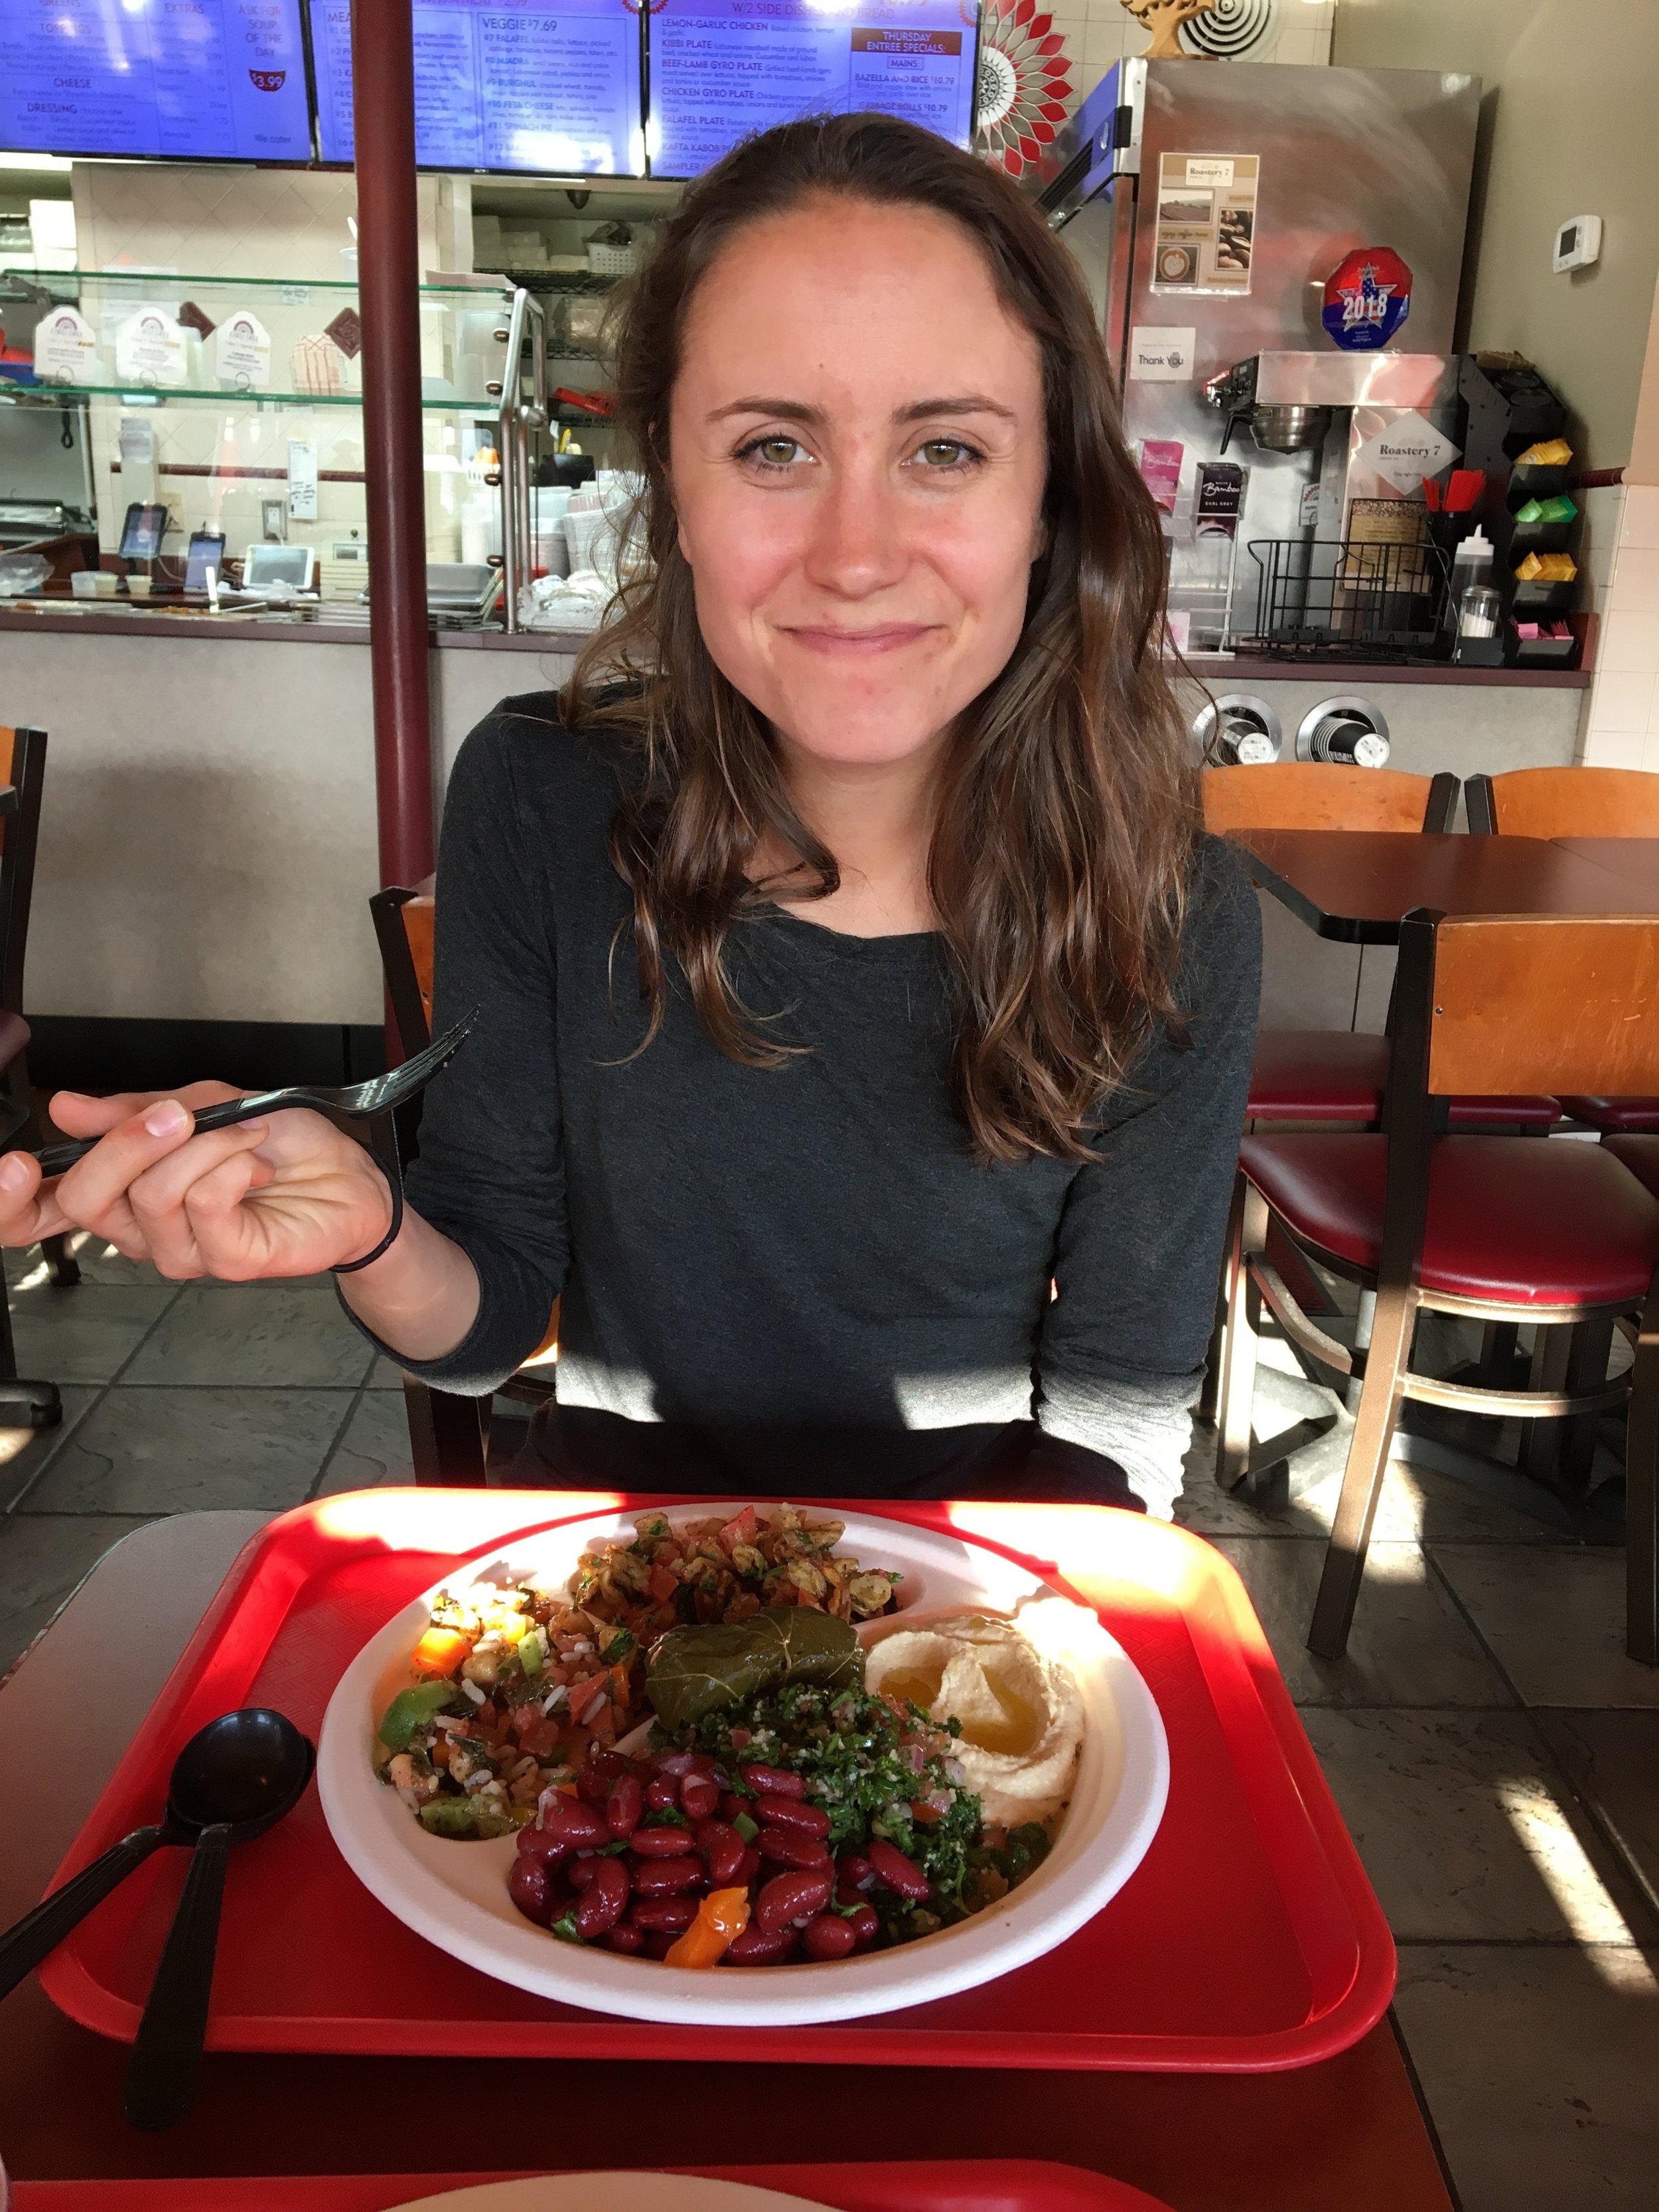 Haley and I enjoying a plate full of Mediterranean goodness from Zakia Deli